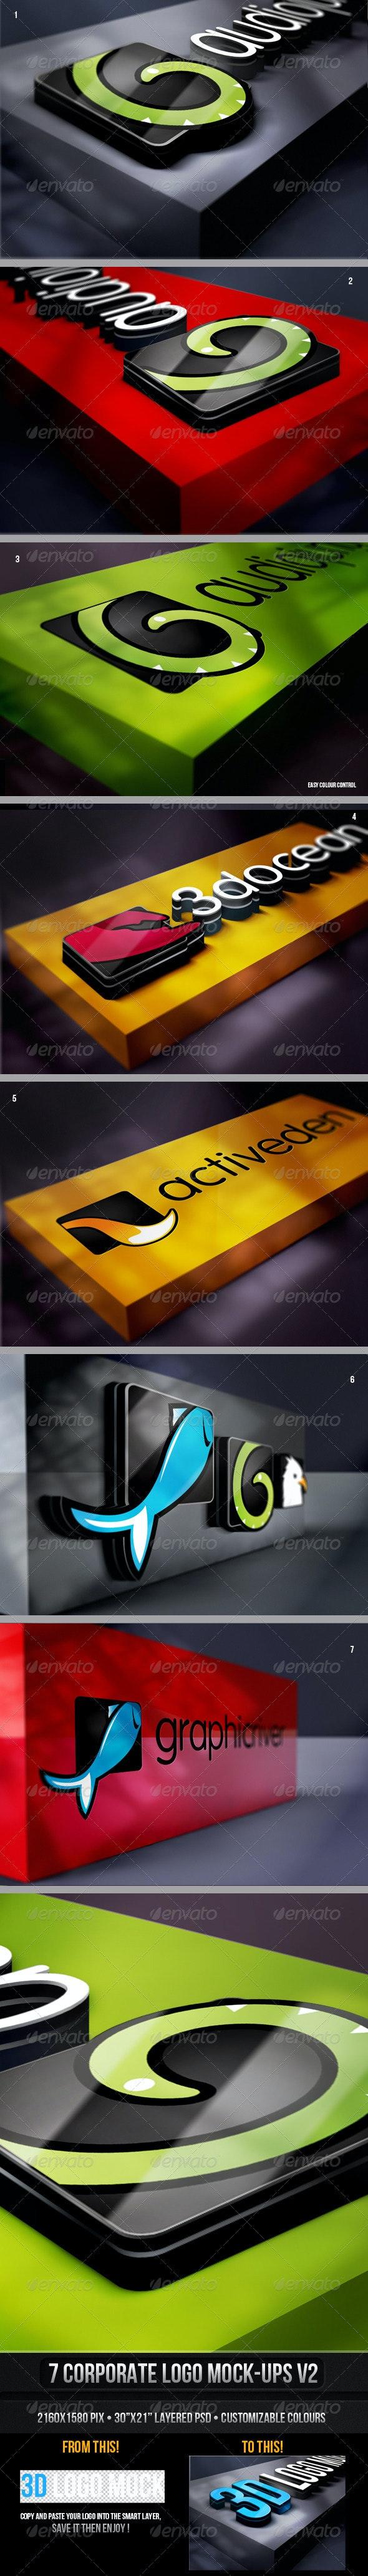 Corporate Logo Mock-up v2 - Logo Product Mock-Ups